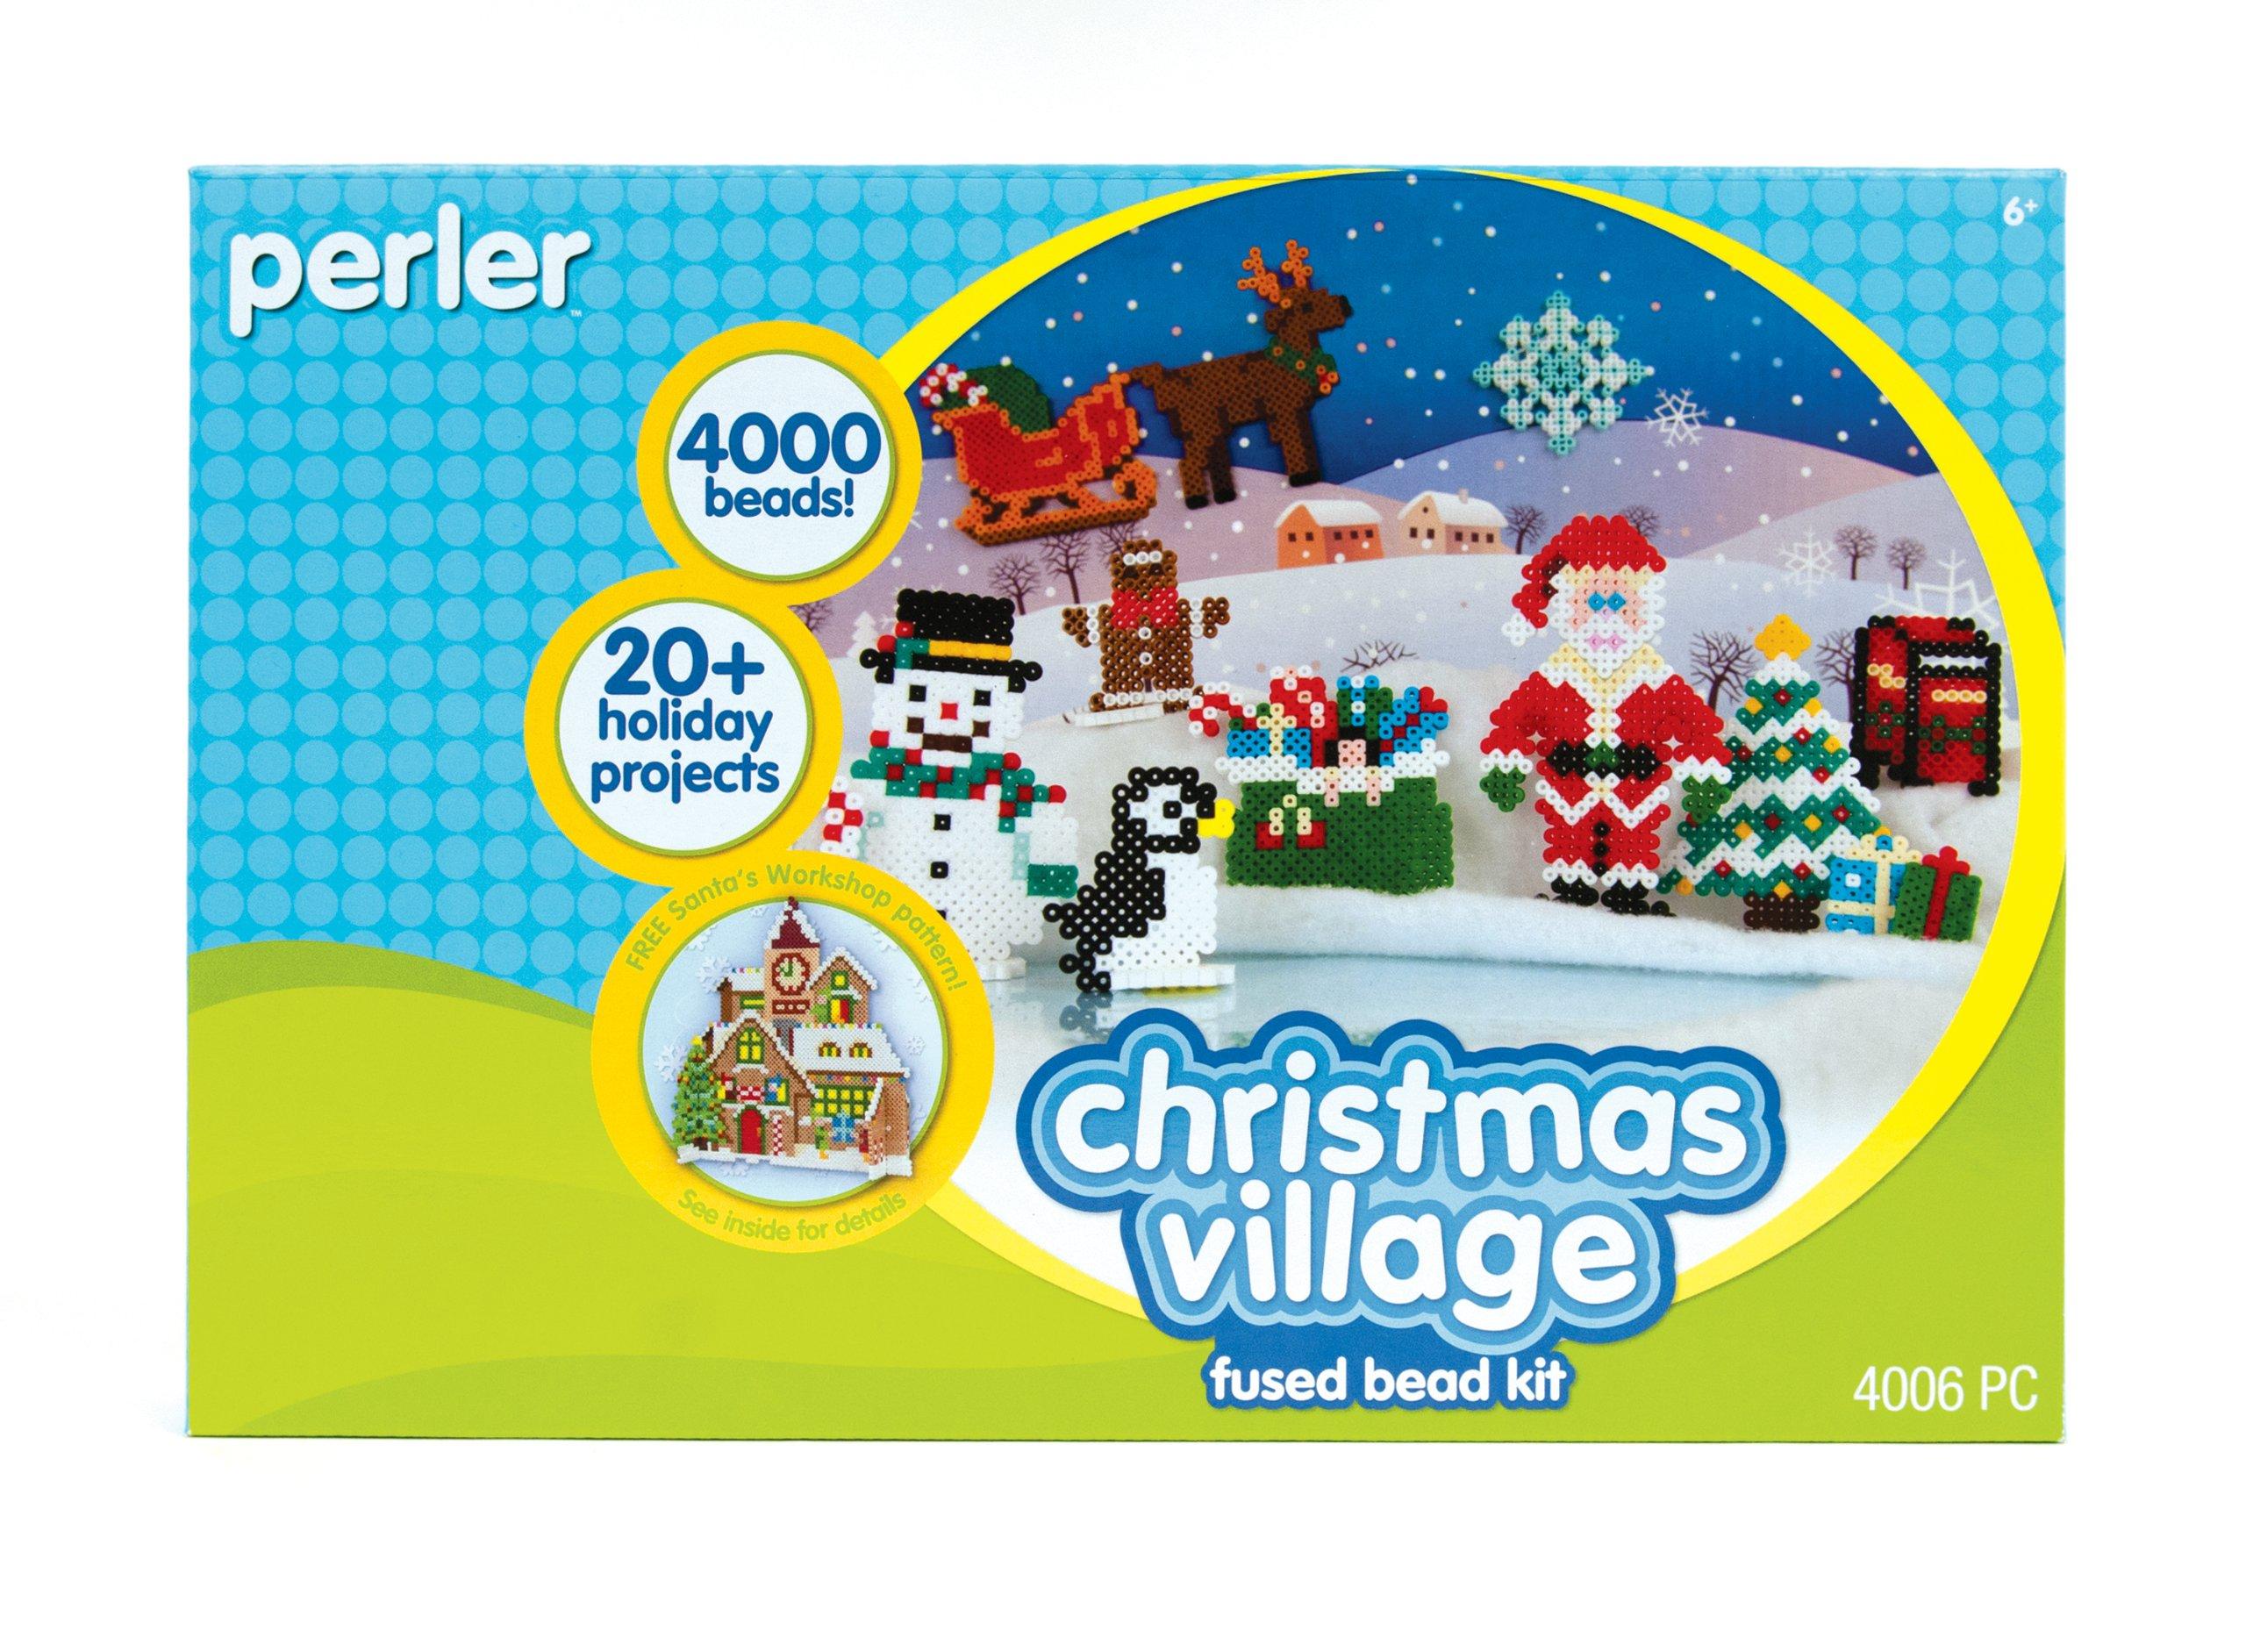 Perler Beads Fused Bead Kit - Christmas Village by Perler